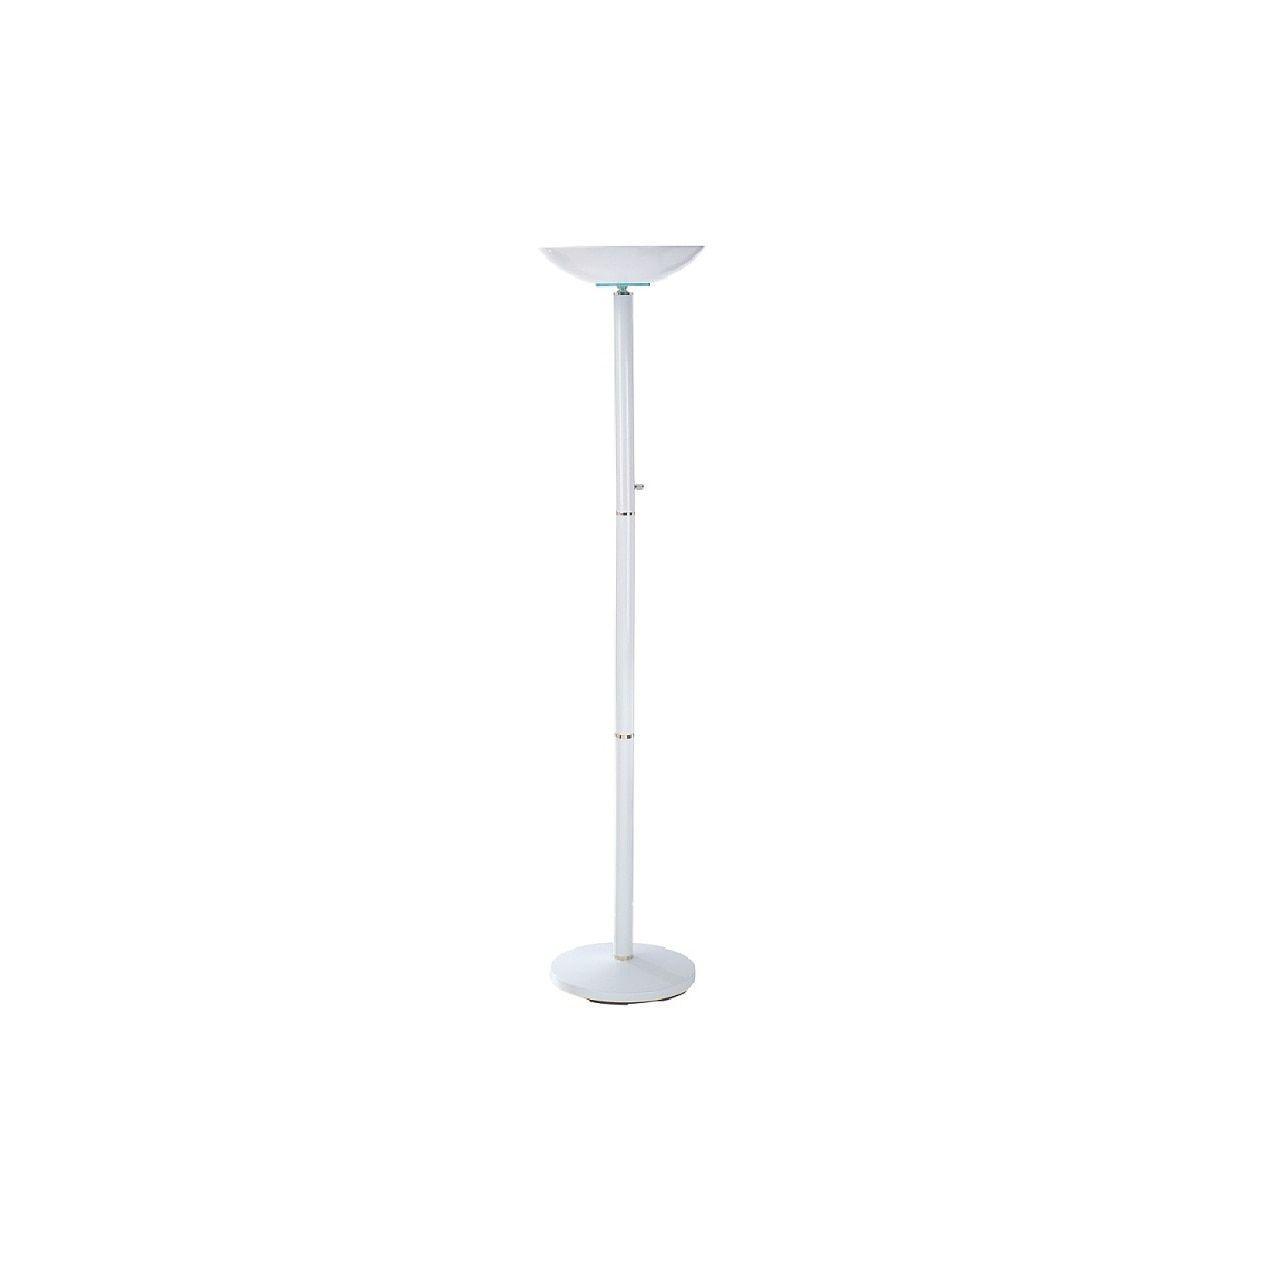 Q-Max 71-inch Torchiere Floor Lamp